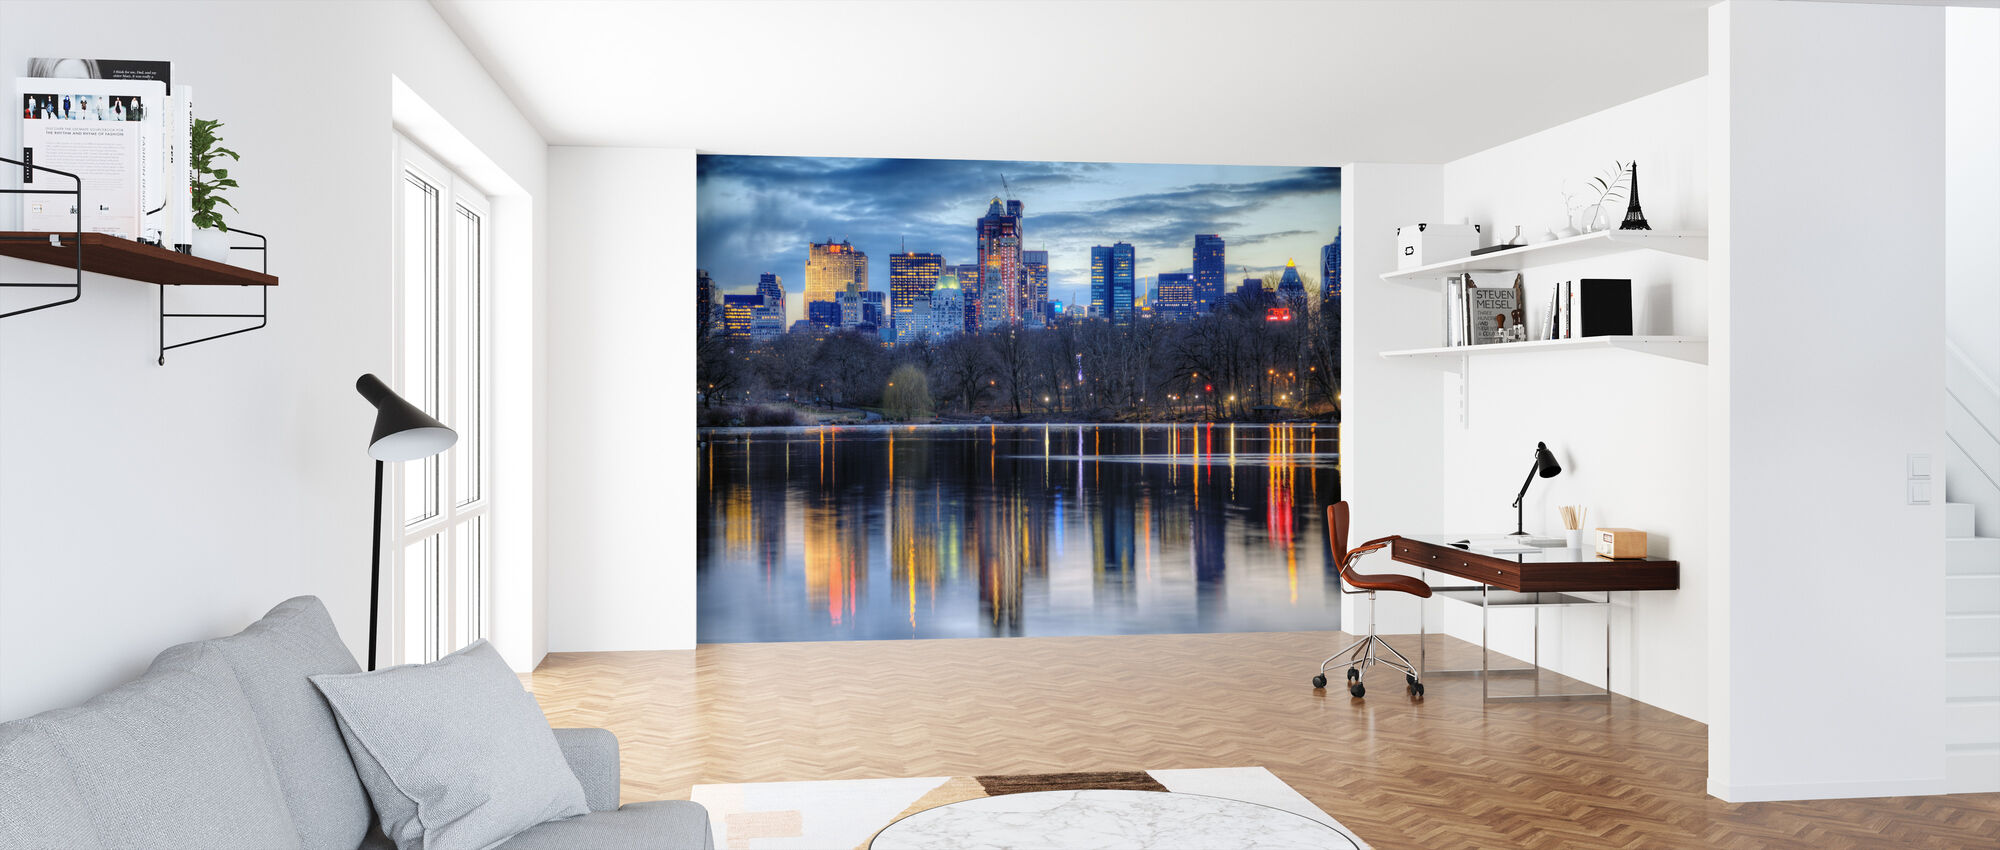 New York Reflexions - Wallpaper - Office